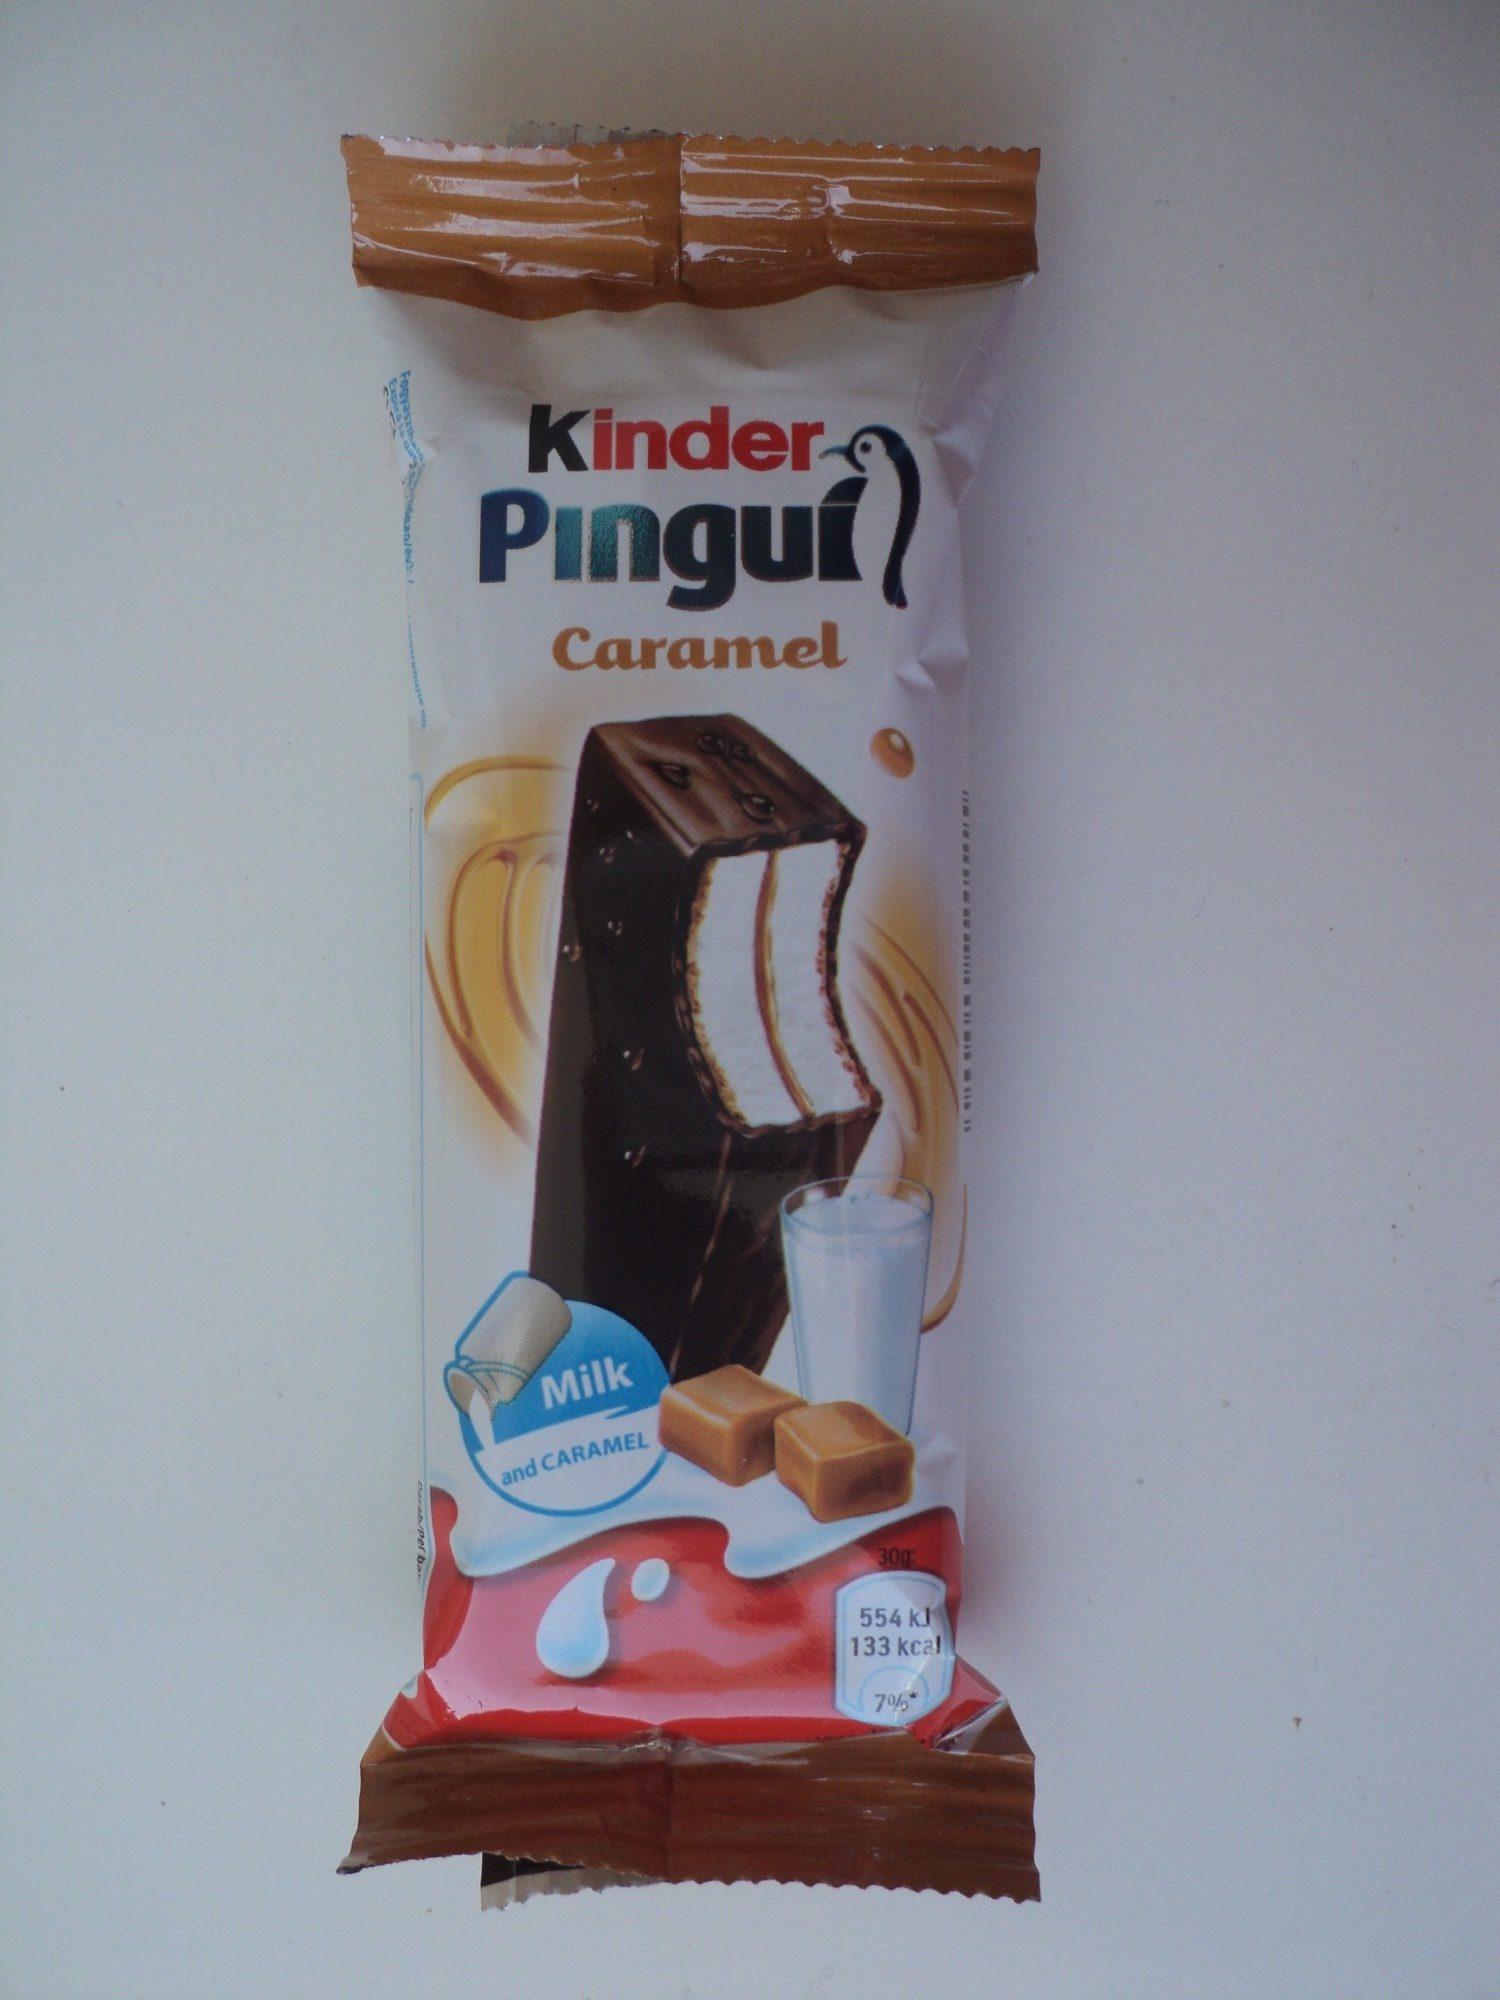 Kinder Pingu Prajitura cu lapte si caramel trasa in ciocolata - Product - ro